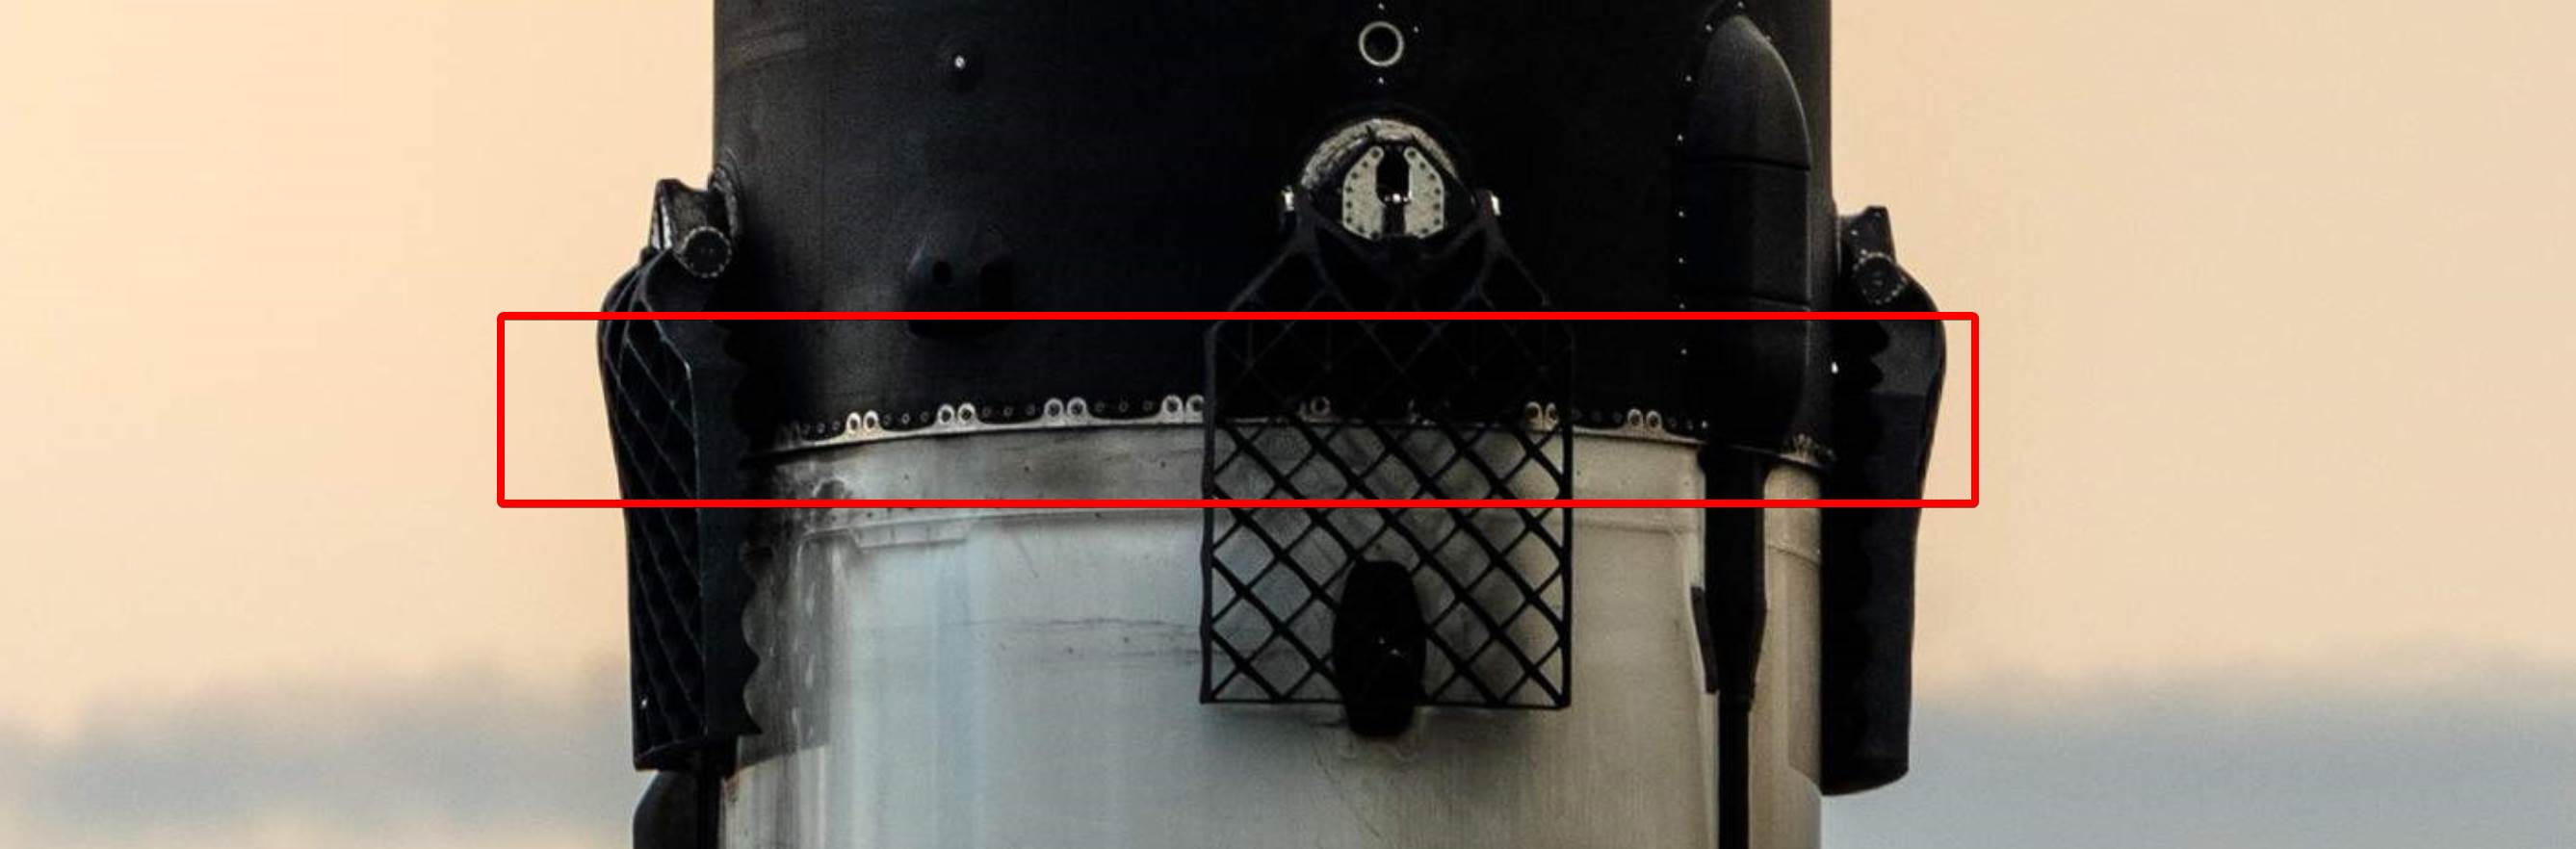 Falcon 9 B1056 CRS-17 Cargo Dragon OCISLY return 050419 (Tom Cross) 6 annotated